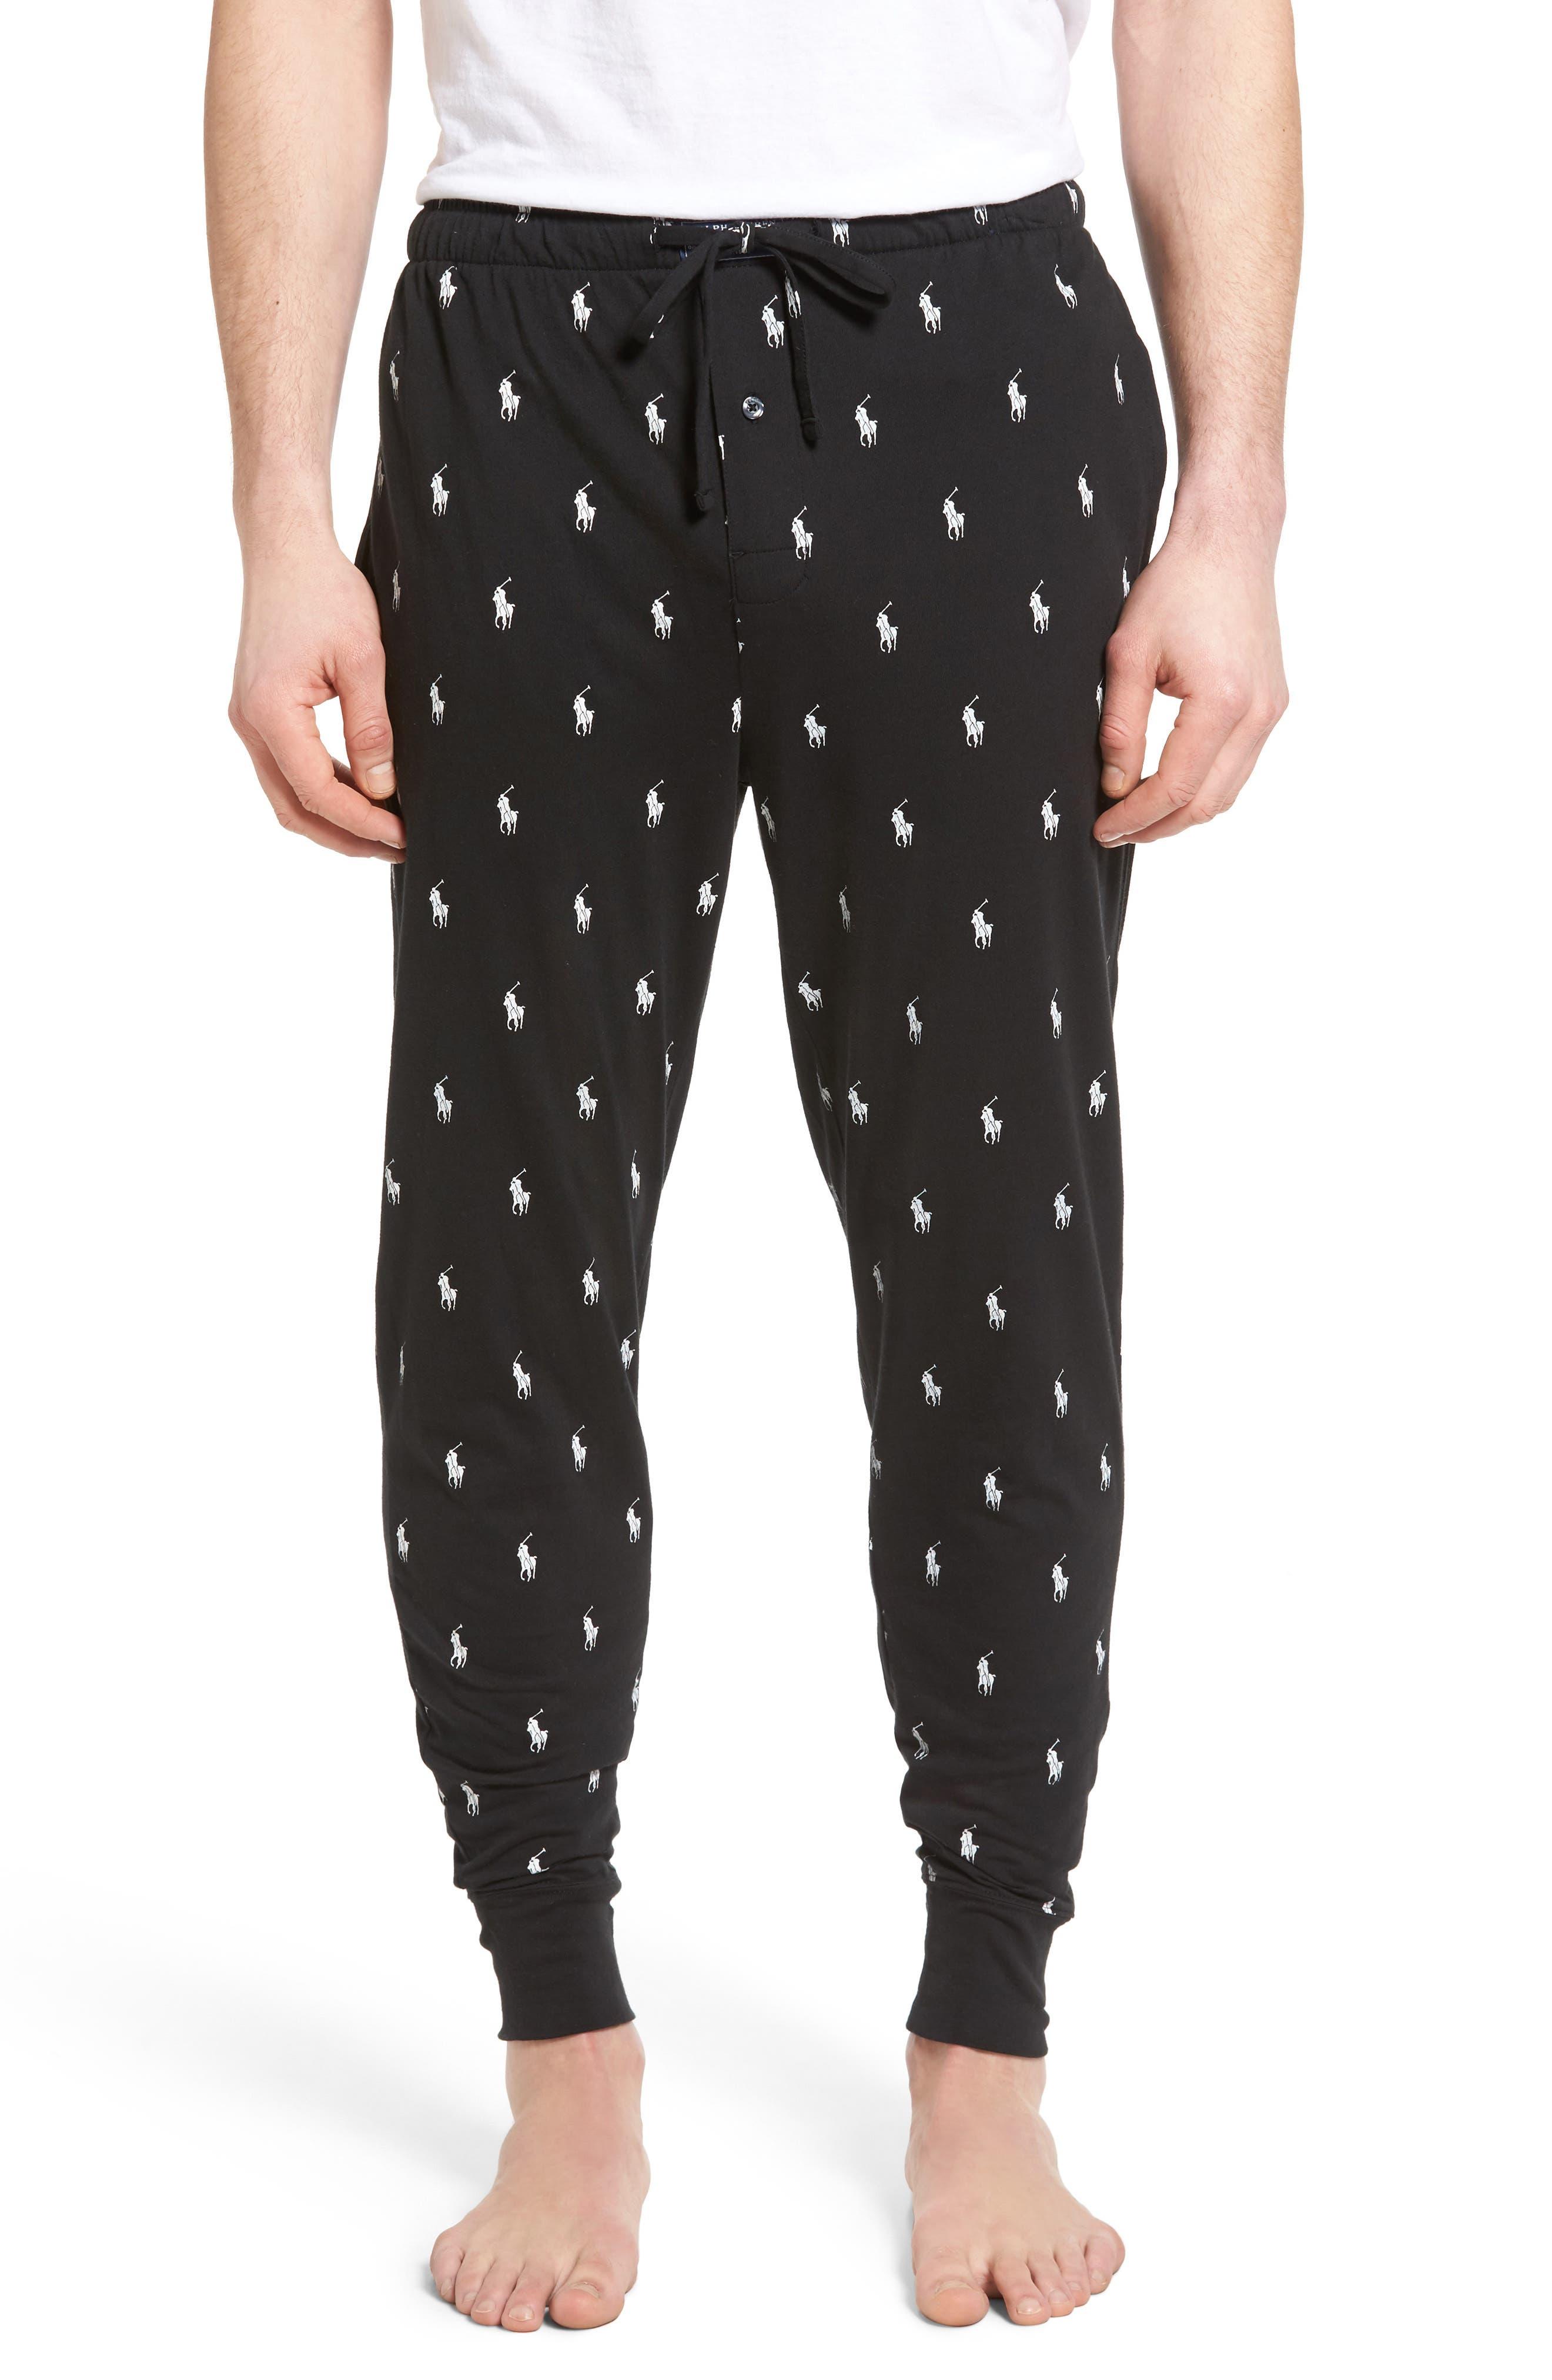 Knit Pony Lounge Pants,                         Main,                         color, 001